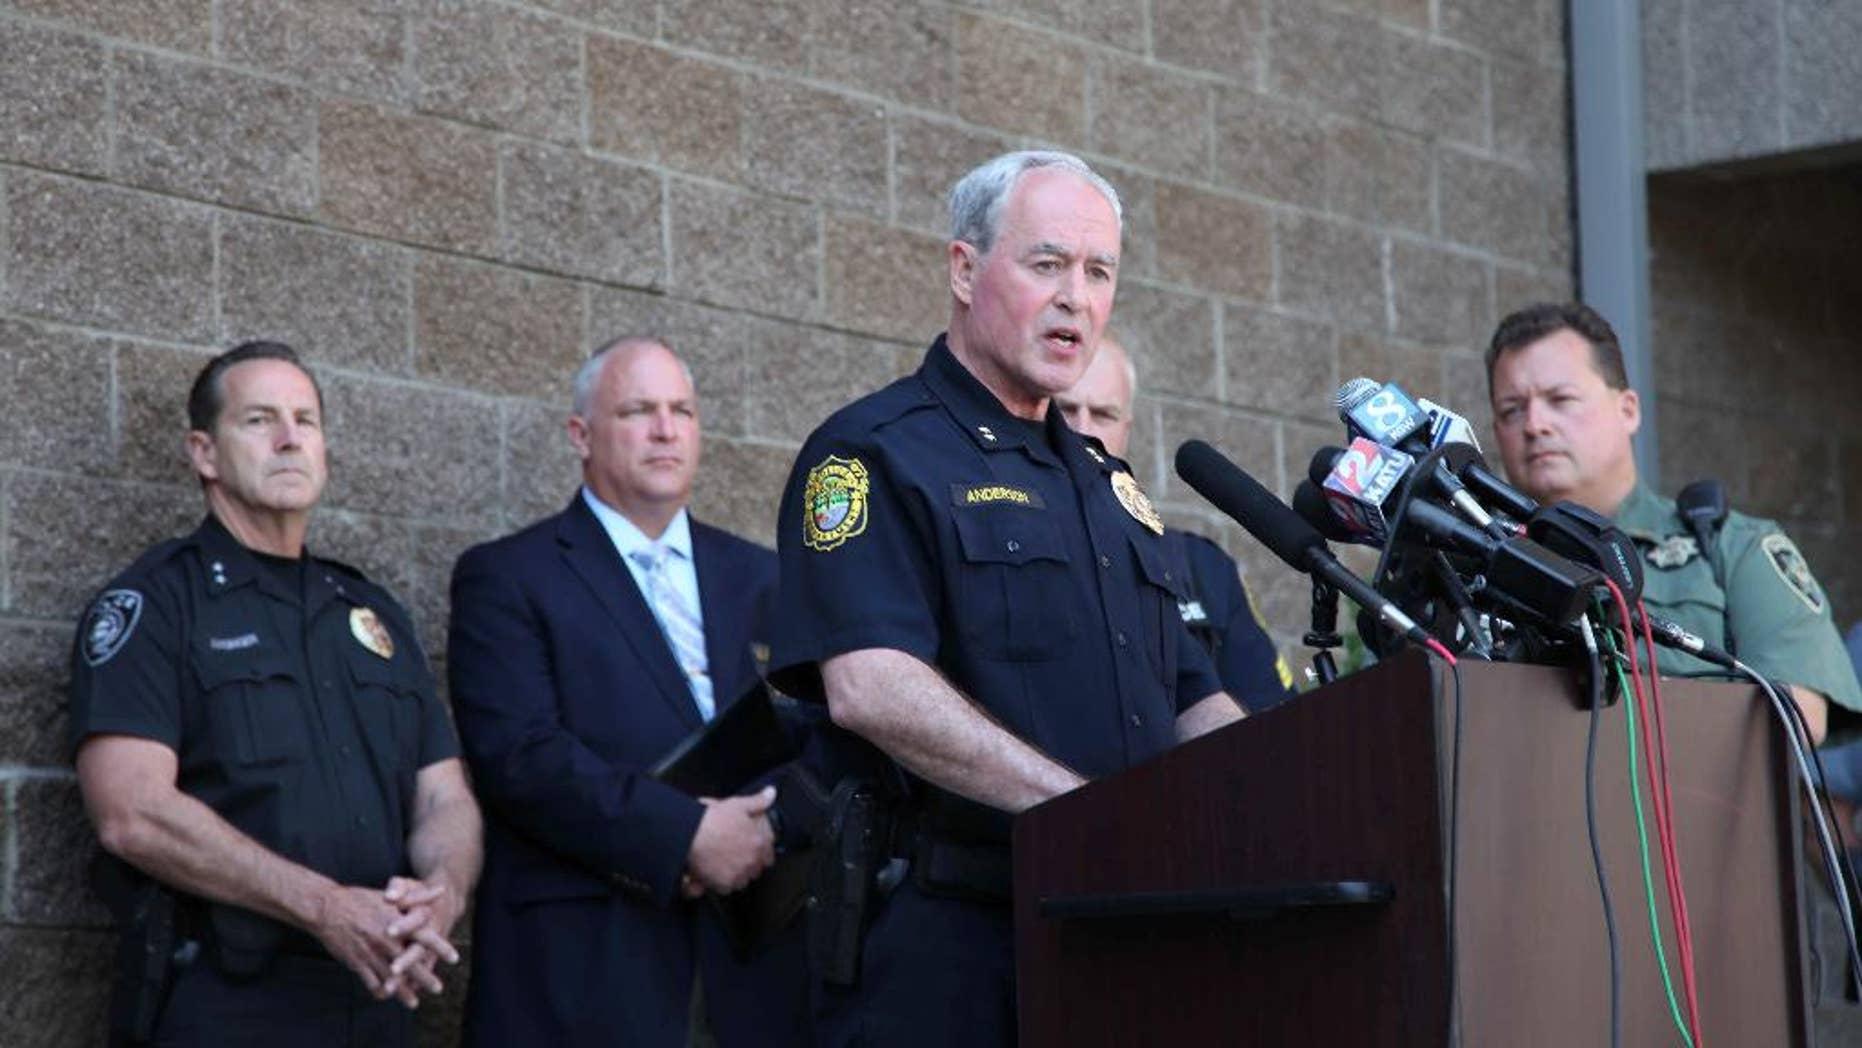 Parents of Oregon school gunman apologize in letter | Fox News